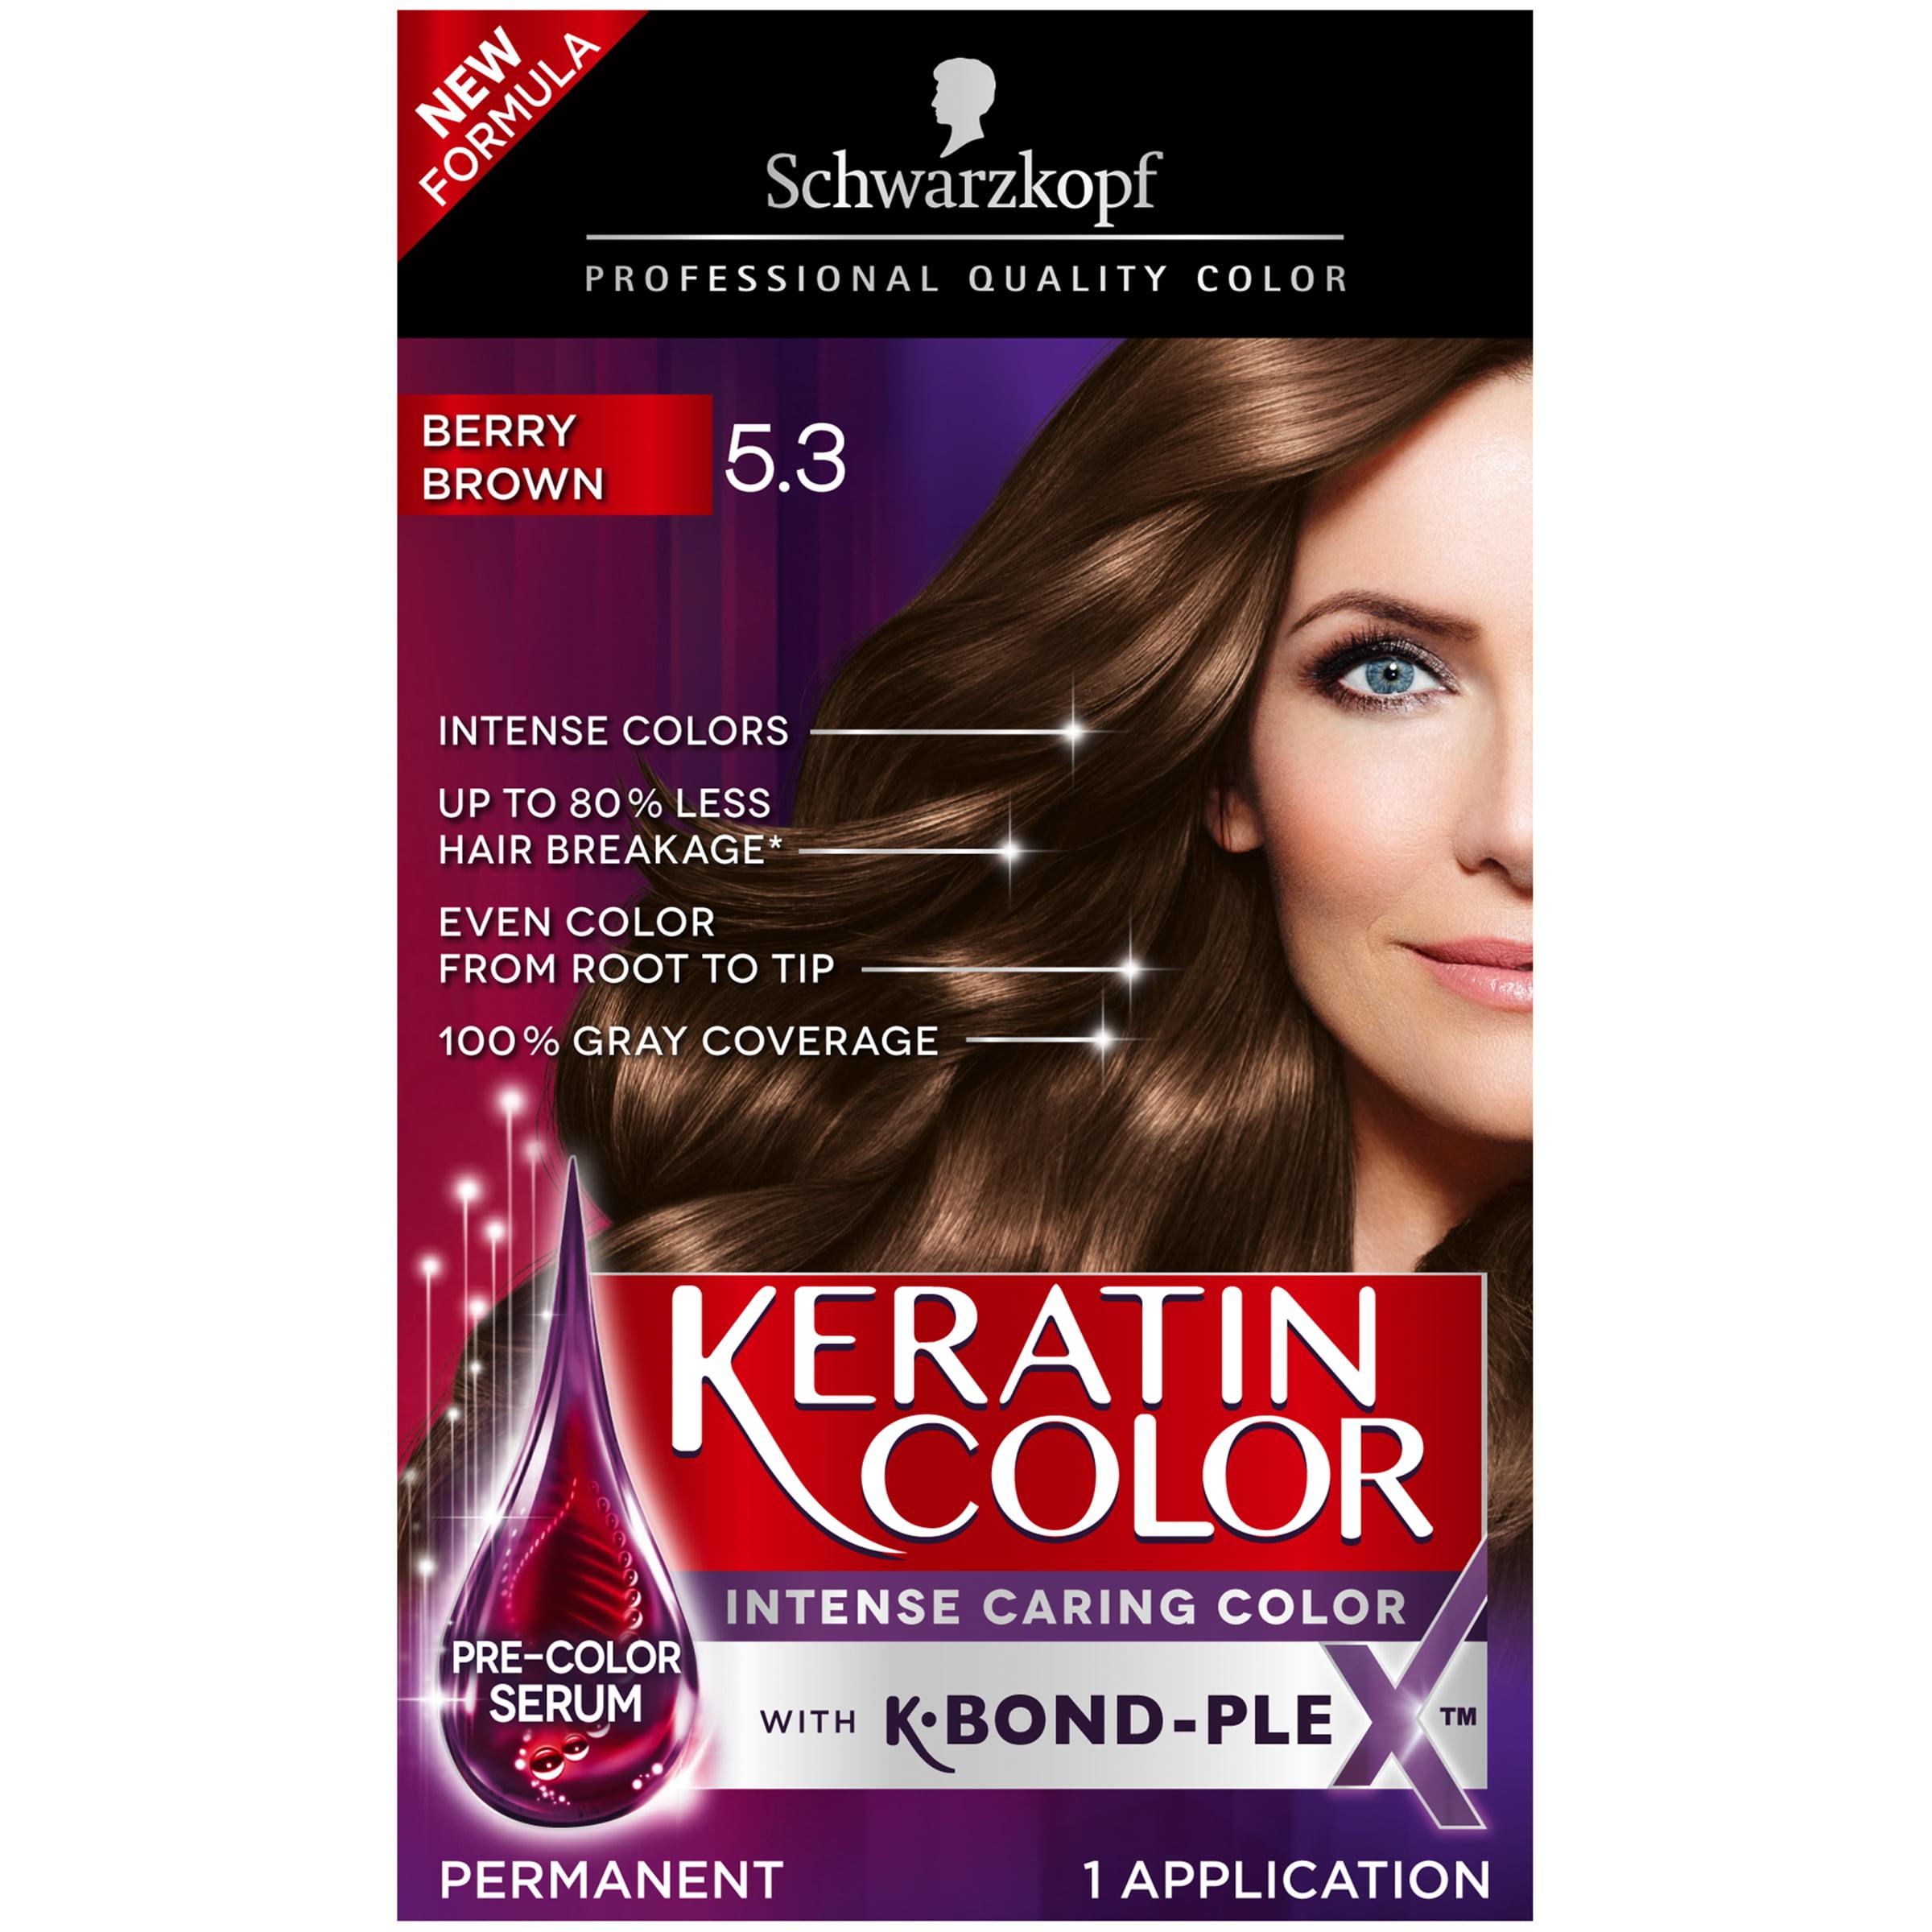 Schwarzkopf Keratin Color Anti Age Hair Color Cream 5 3